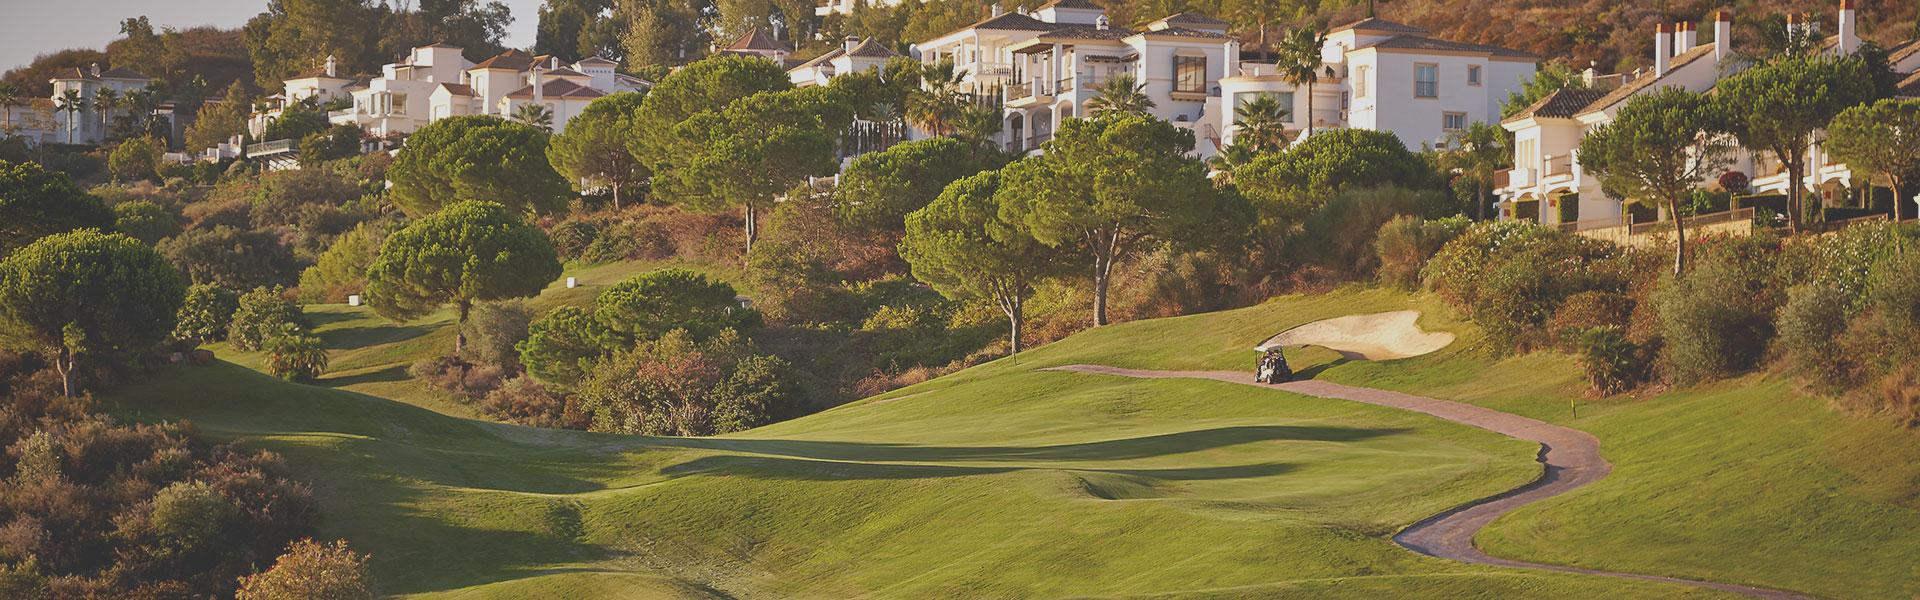 Golf-Expedition-Golf-reizen-Spanje-Regio-Malaga-La-Cala-Resort-golf-course-resort-grijs